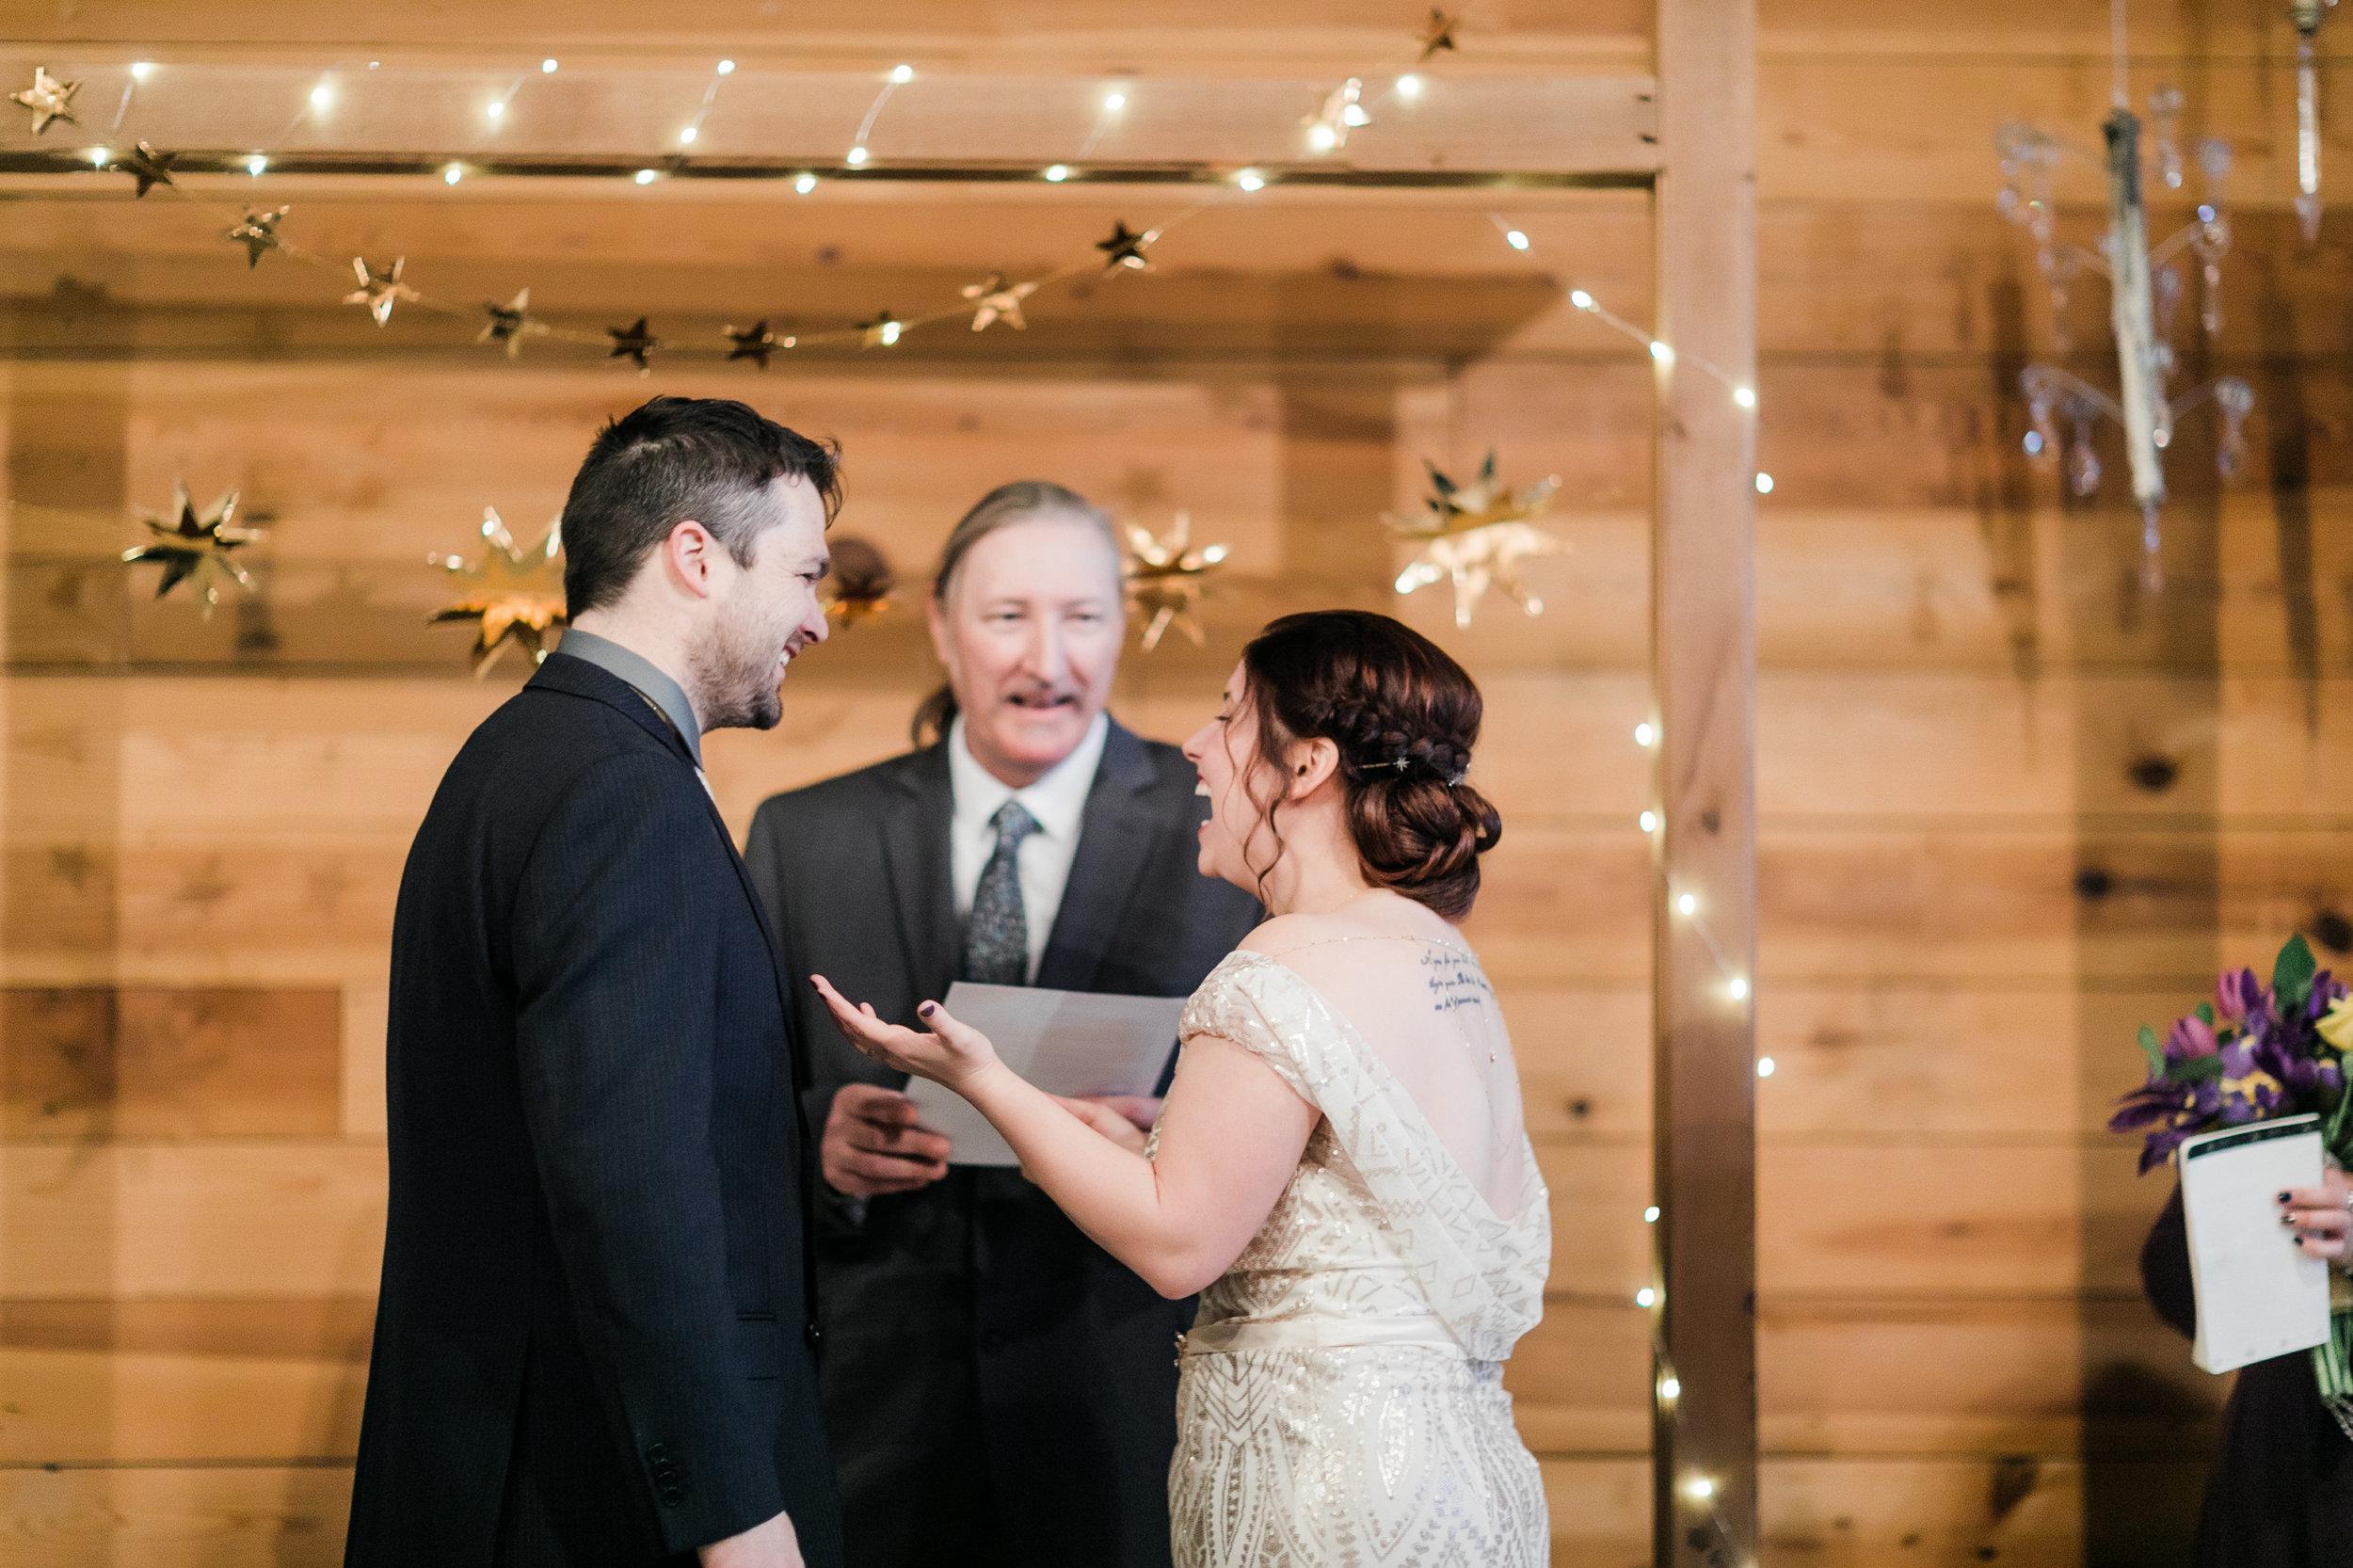 the-rock-barn-henrietta-wedding-photographer-texas-wichita-falls-earth-day-wedding-025.jpg